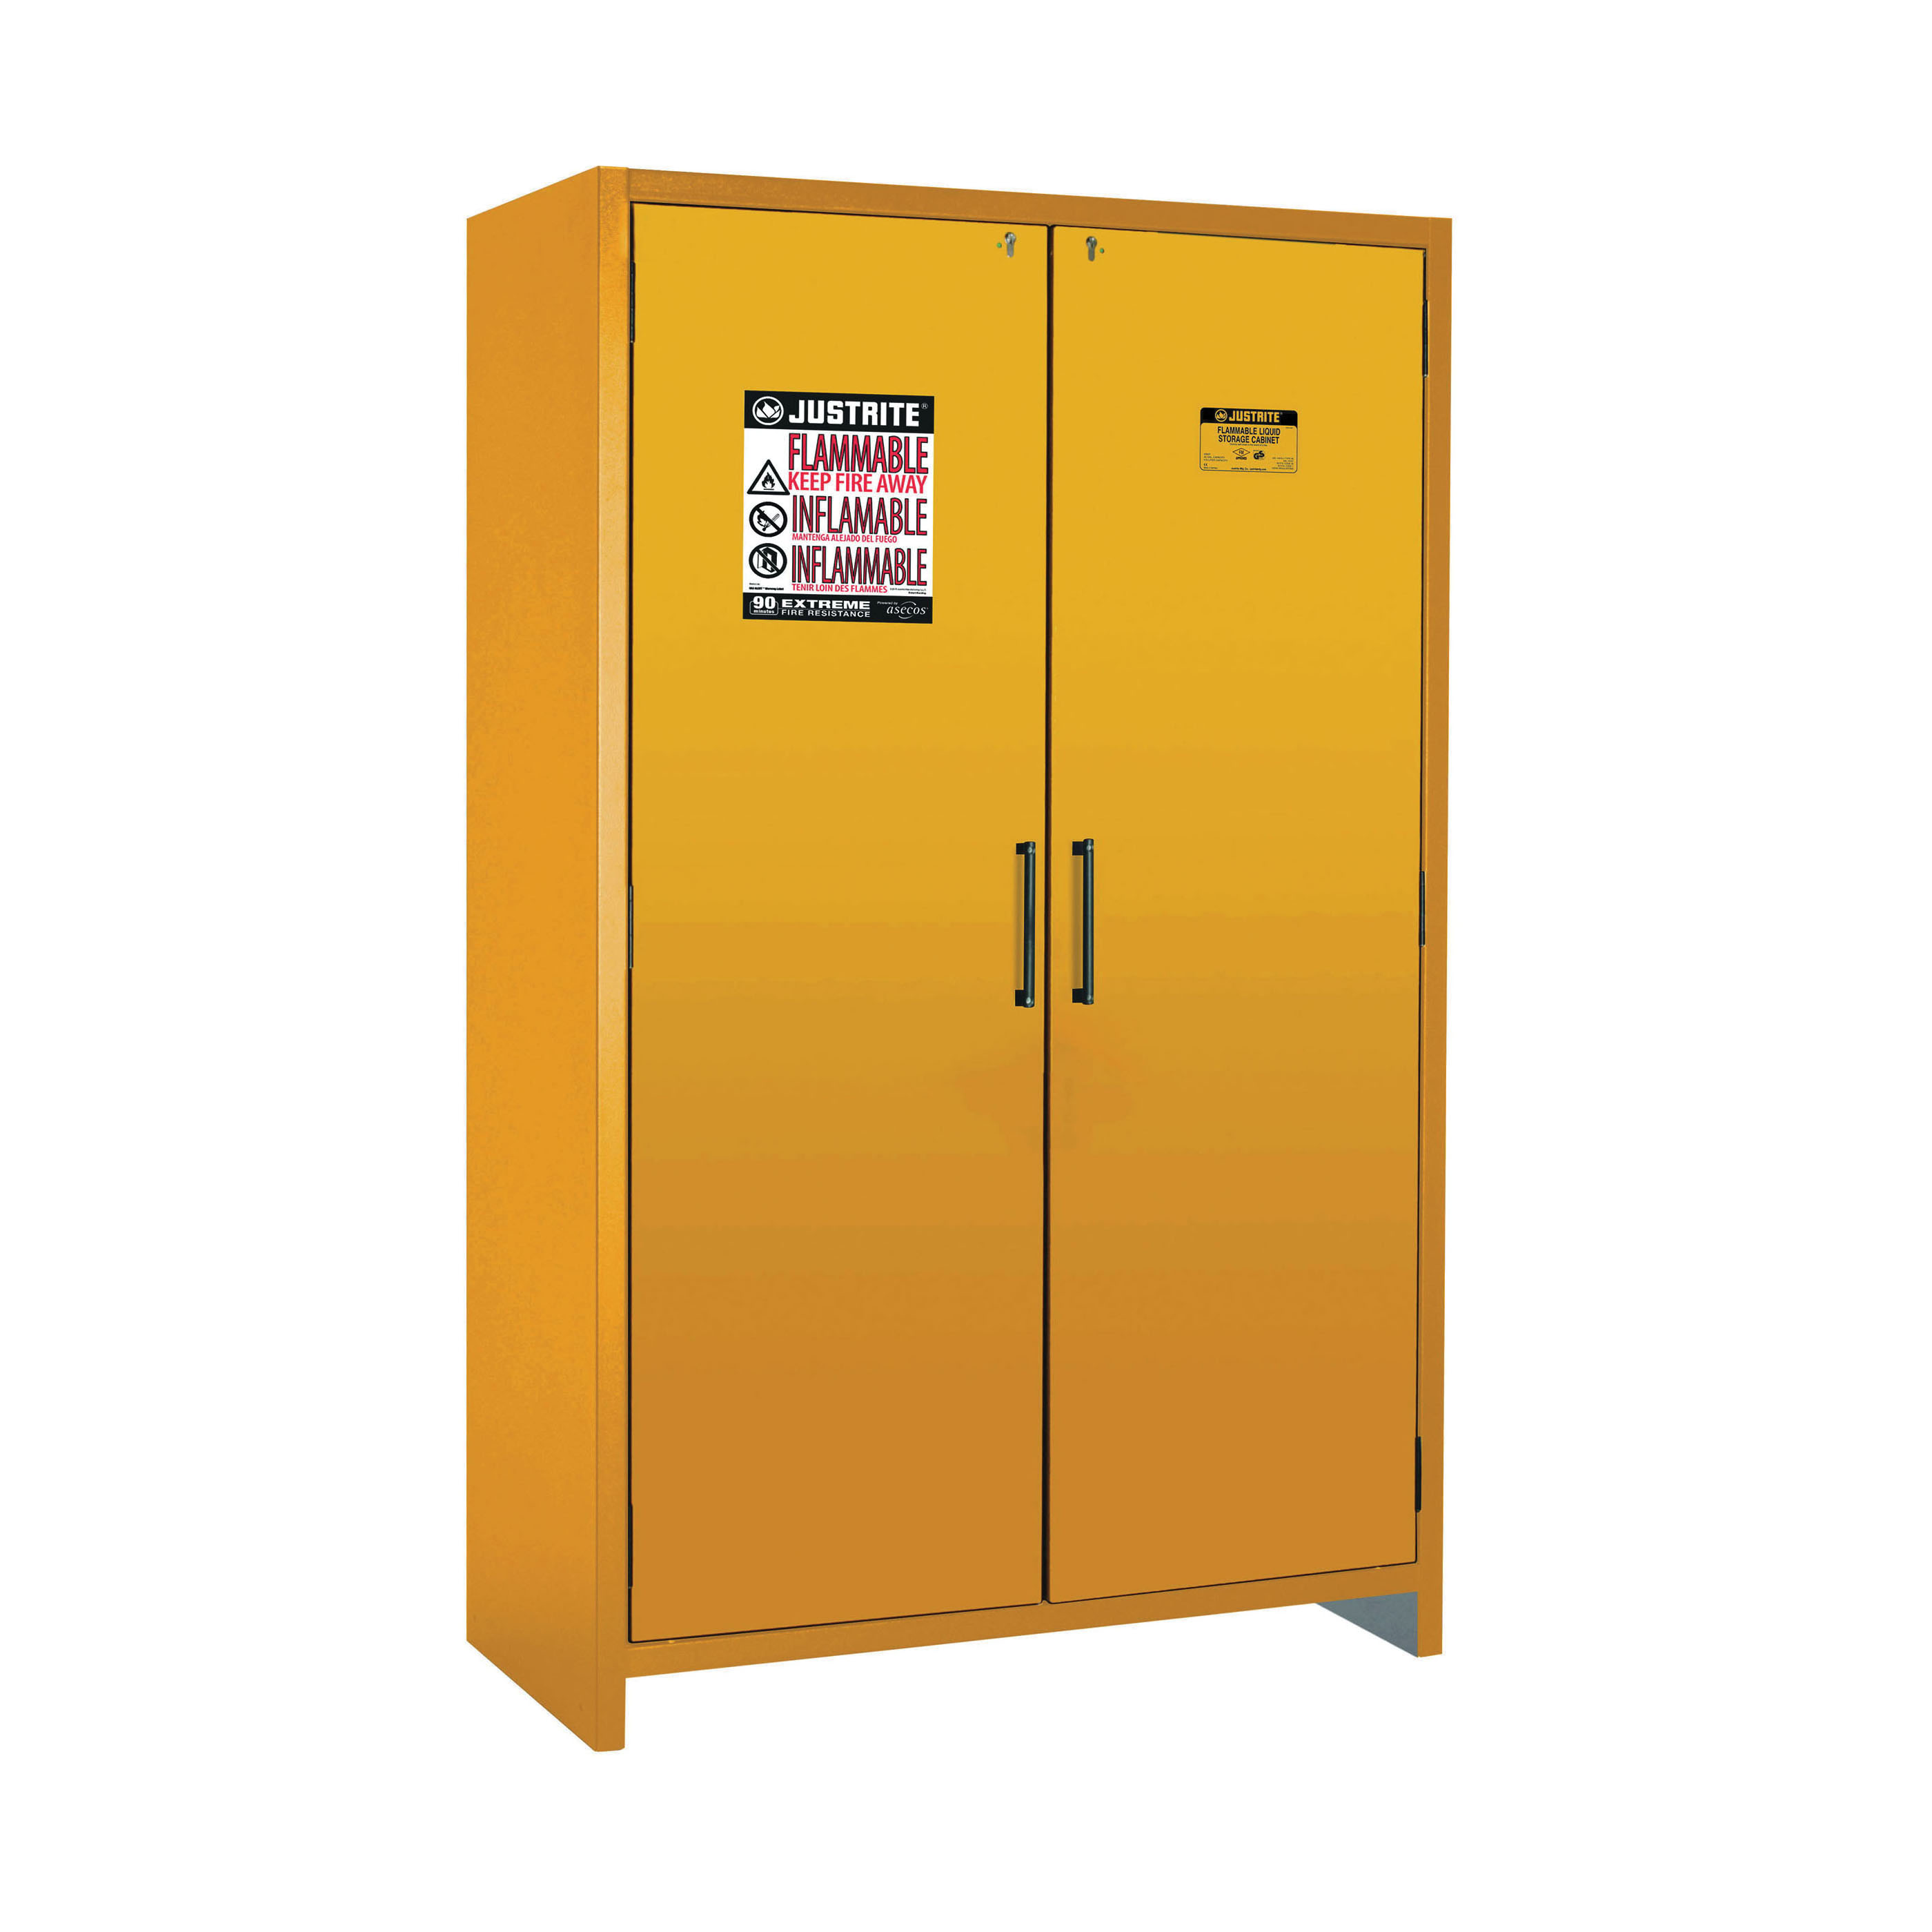 Justrite® 22607 Standard Flammable Safety Cabinet, 45 gal Capacity, Bar Handle, 76.89 in H x 46.97 in W x 24.21 in D, Hybrid Close Door, 2 Doors, 3 Shelves, Steel, Yellow